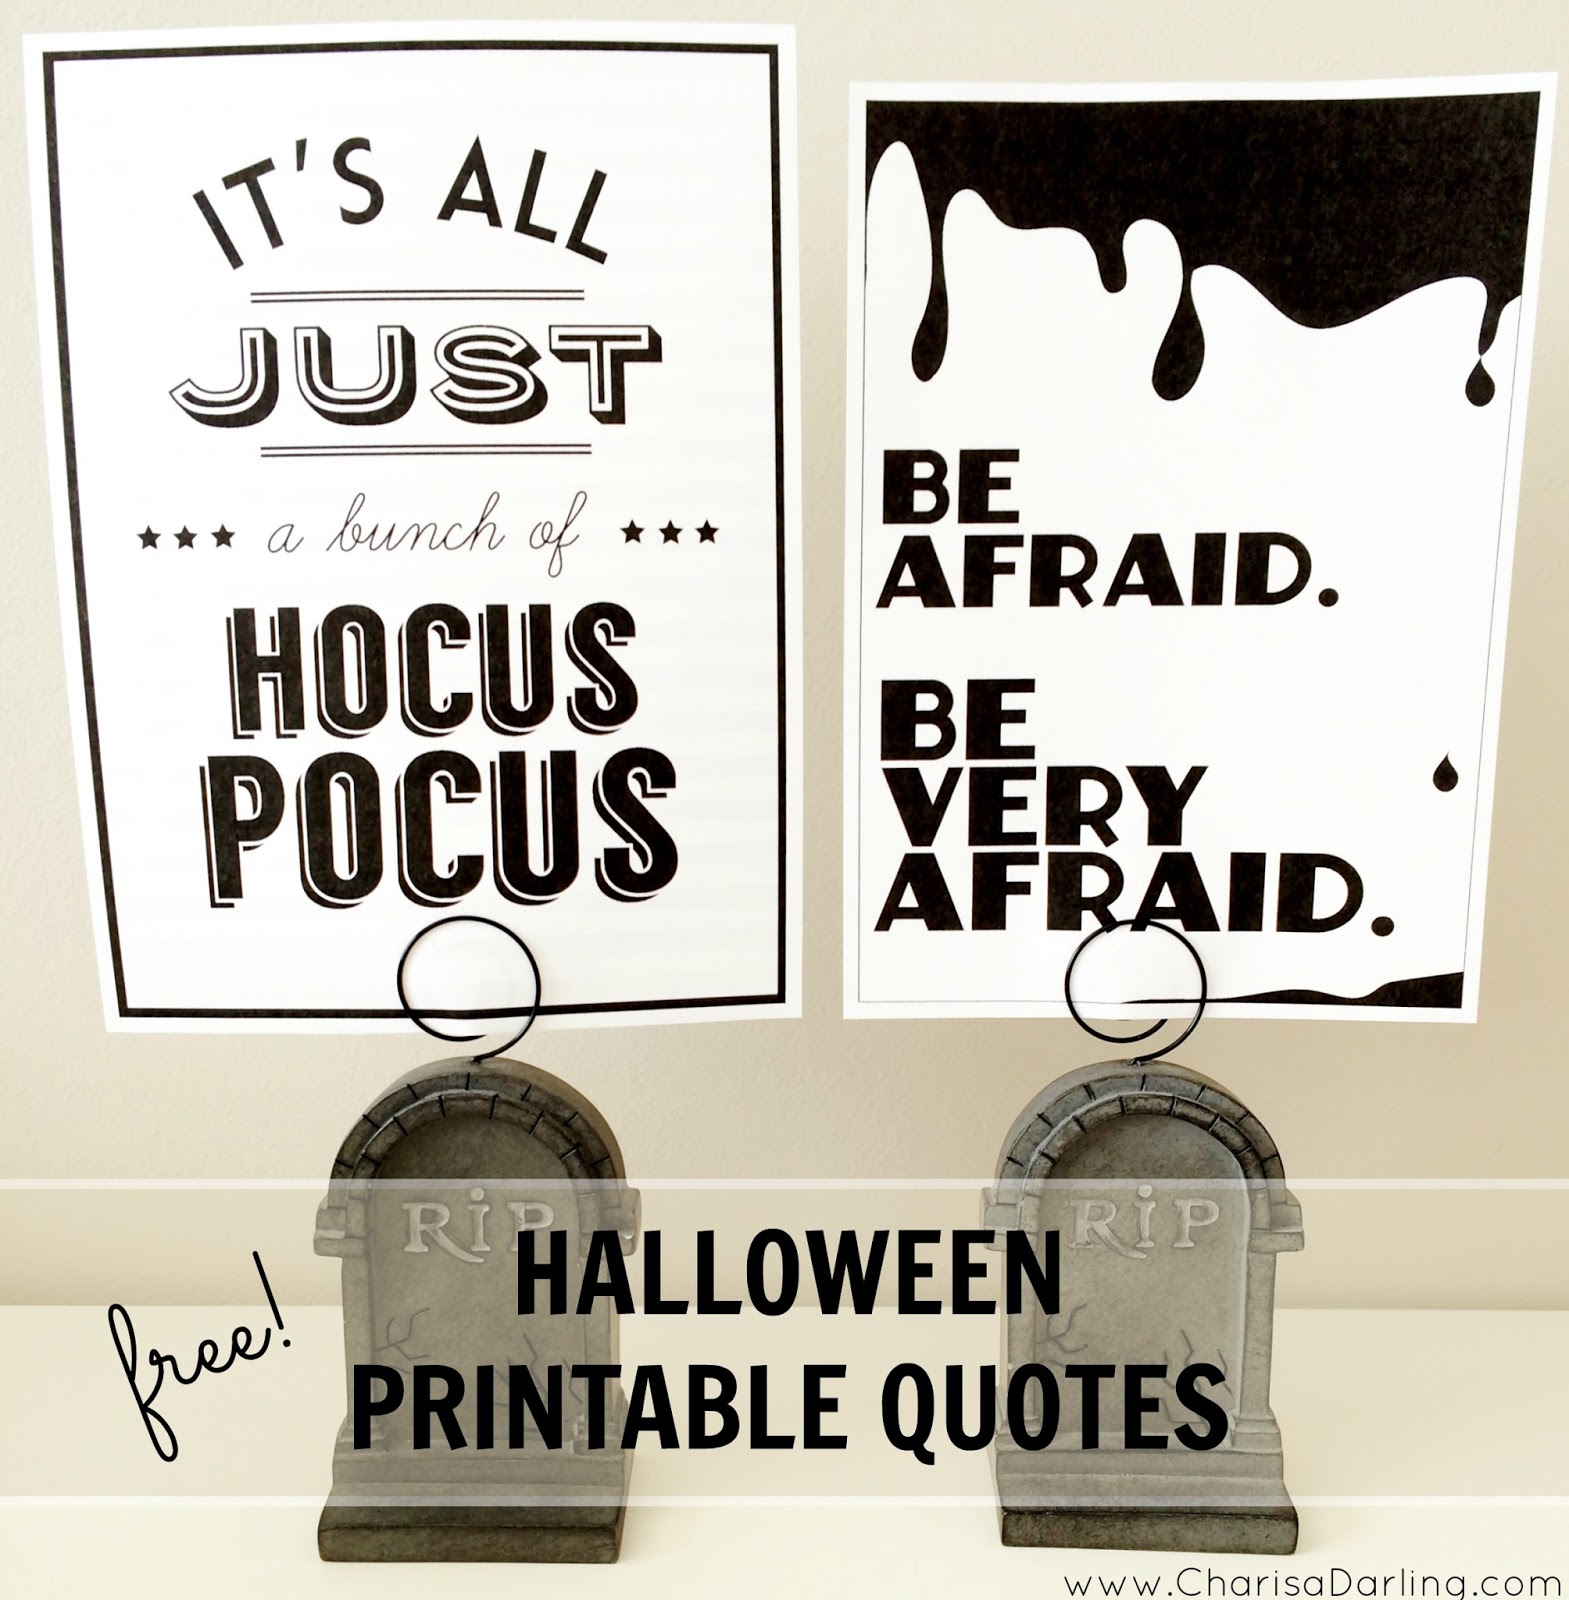 Free Halloween Printable Quotes Charisa Darling